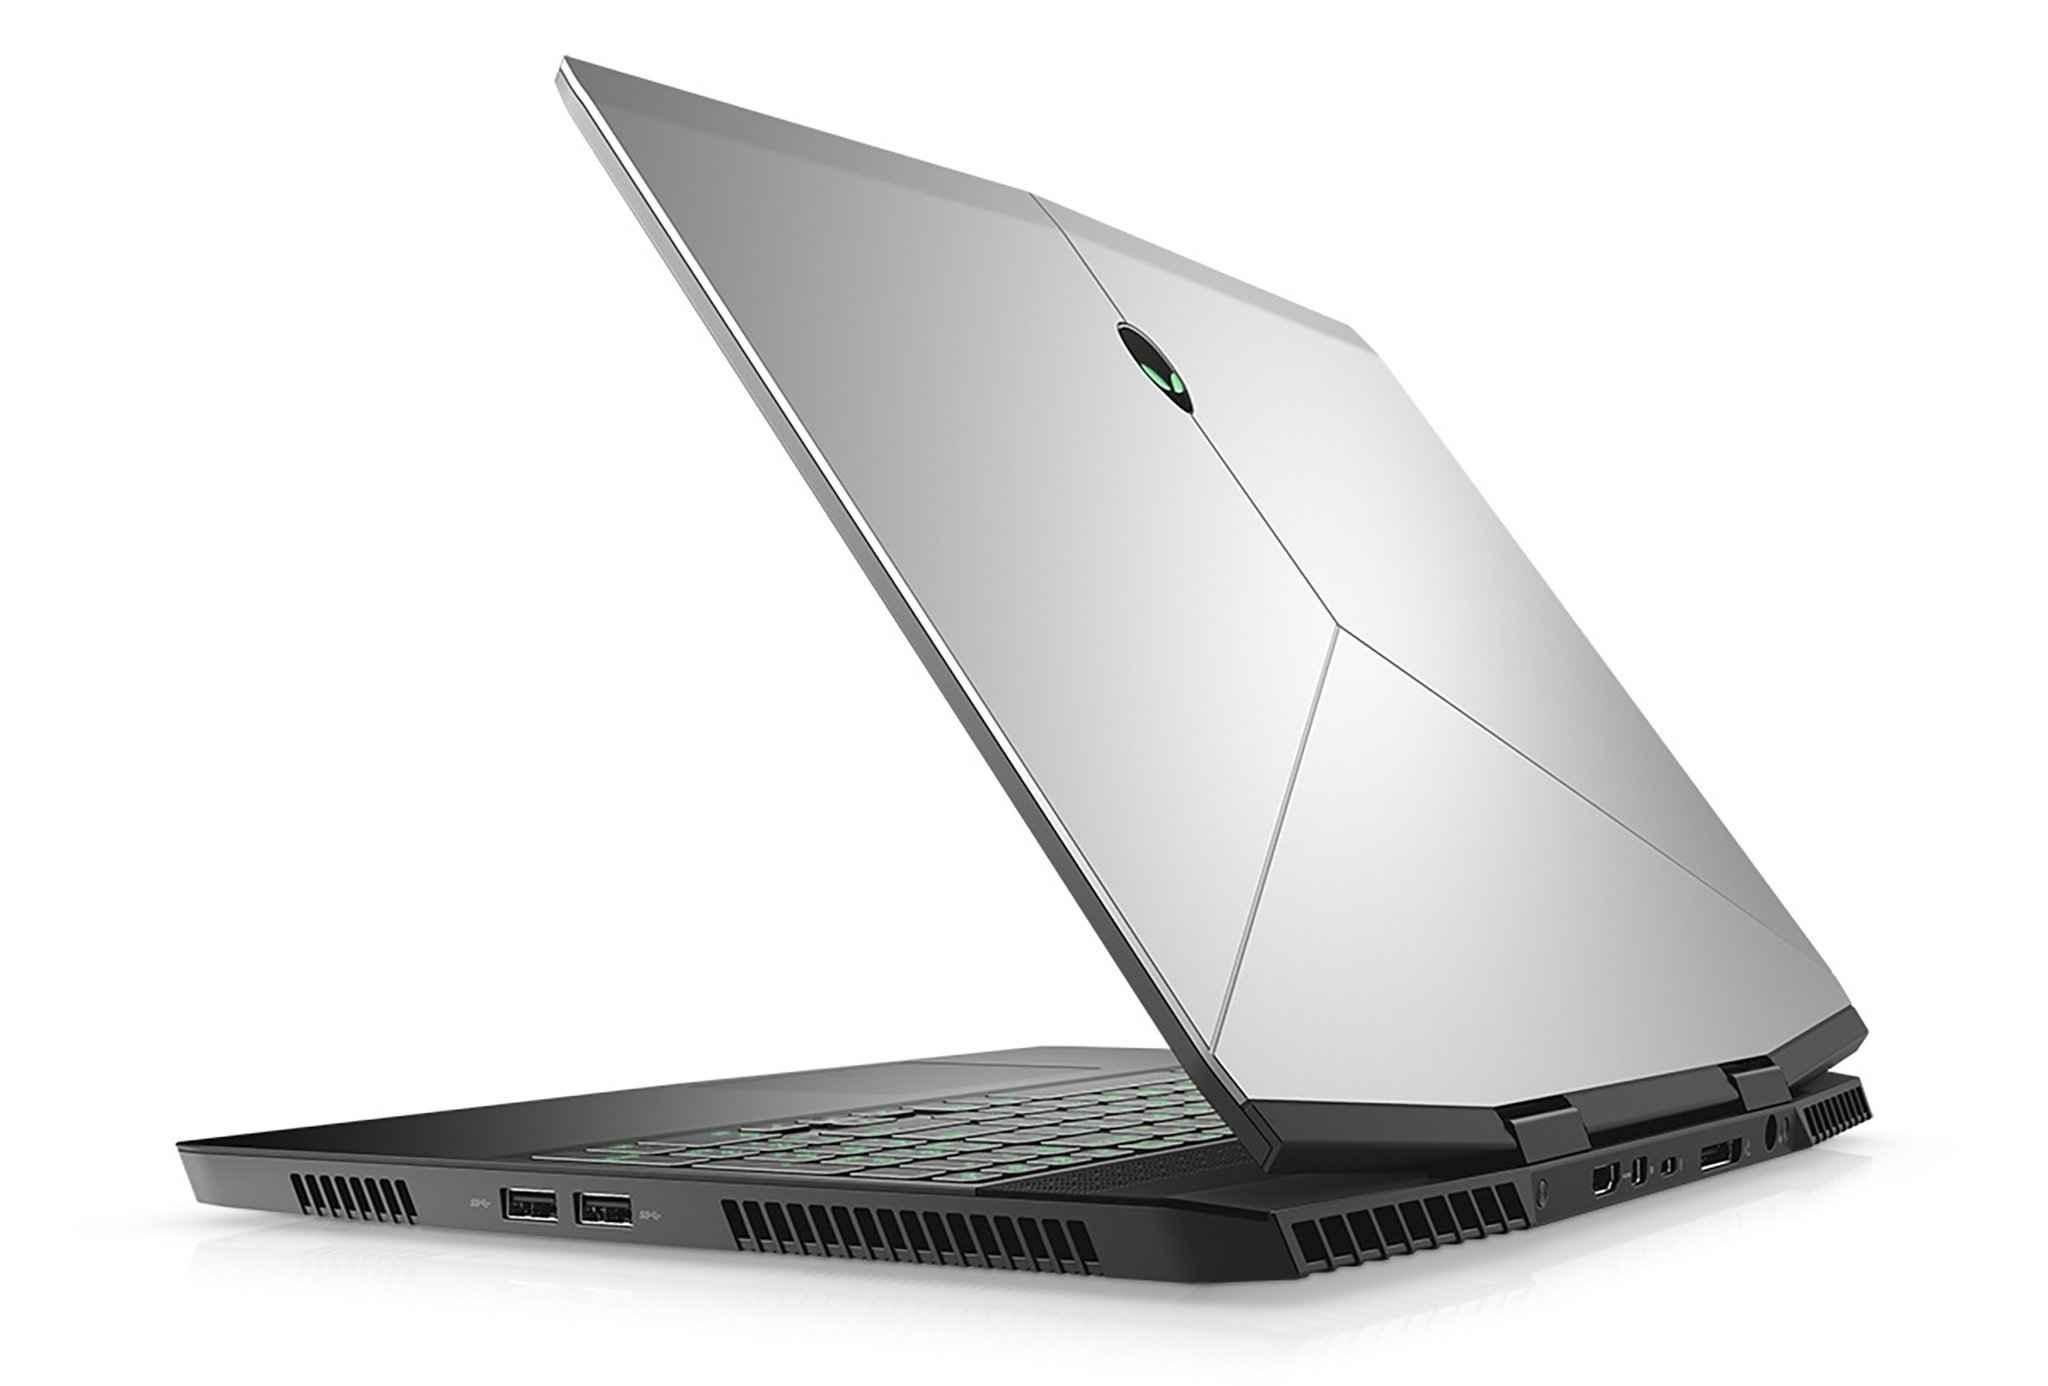 Dell Alienware m15 features